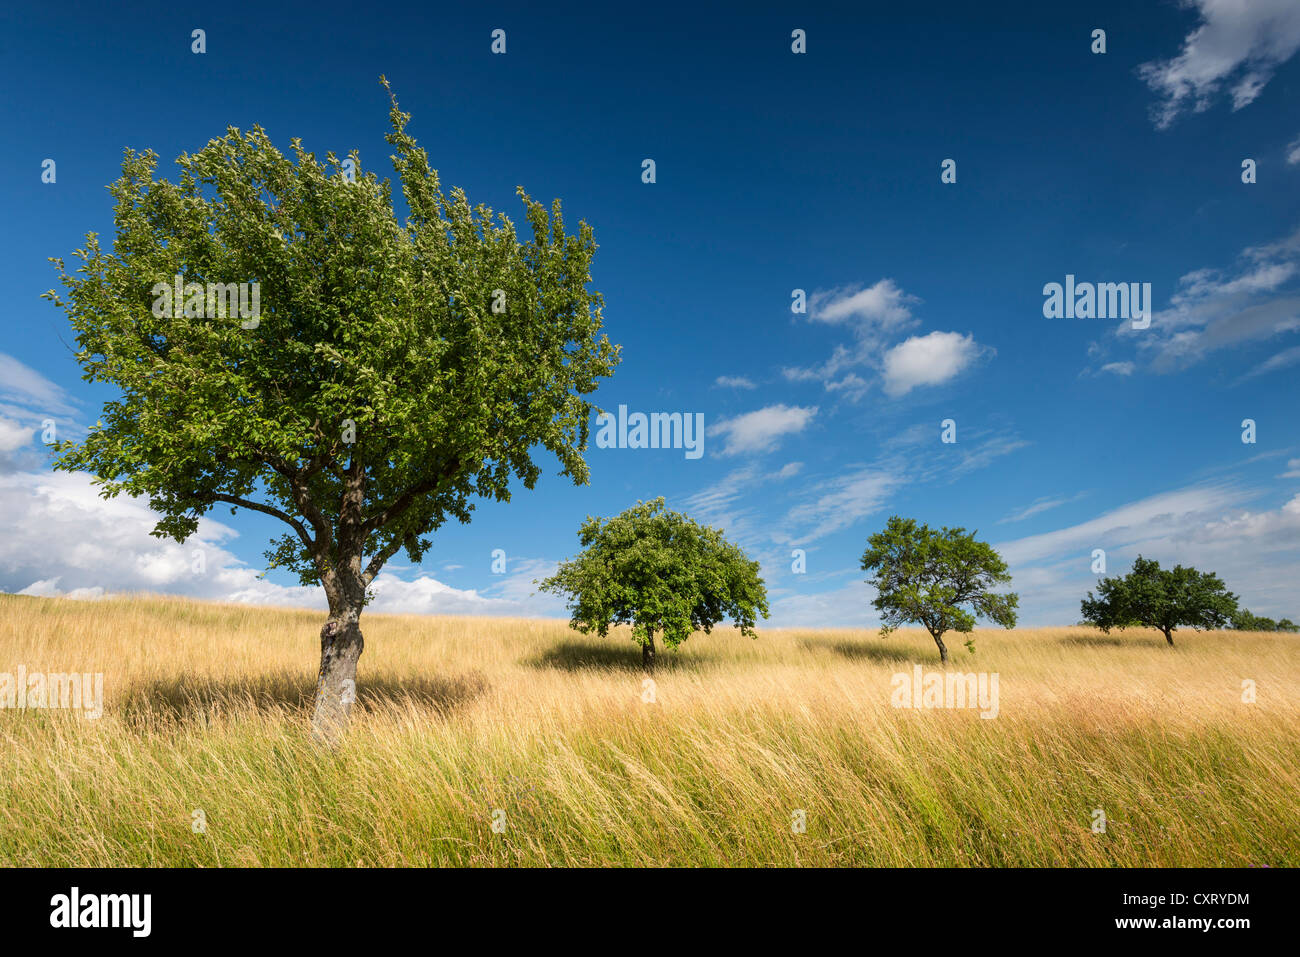 Summer, grassland with fruit trees, Hegau region, Welschingen, Baden-Wuerttemberg, Germany, Europe - Stock Image